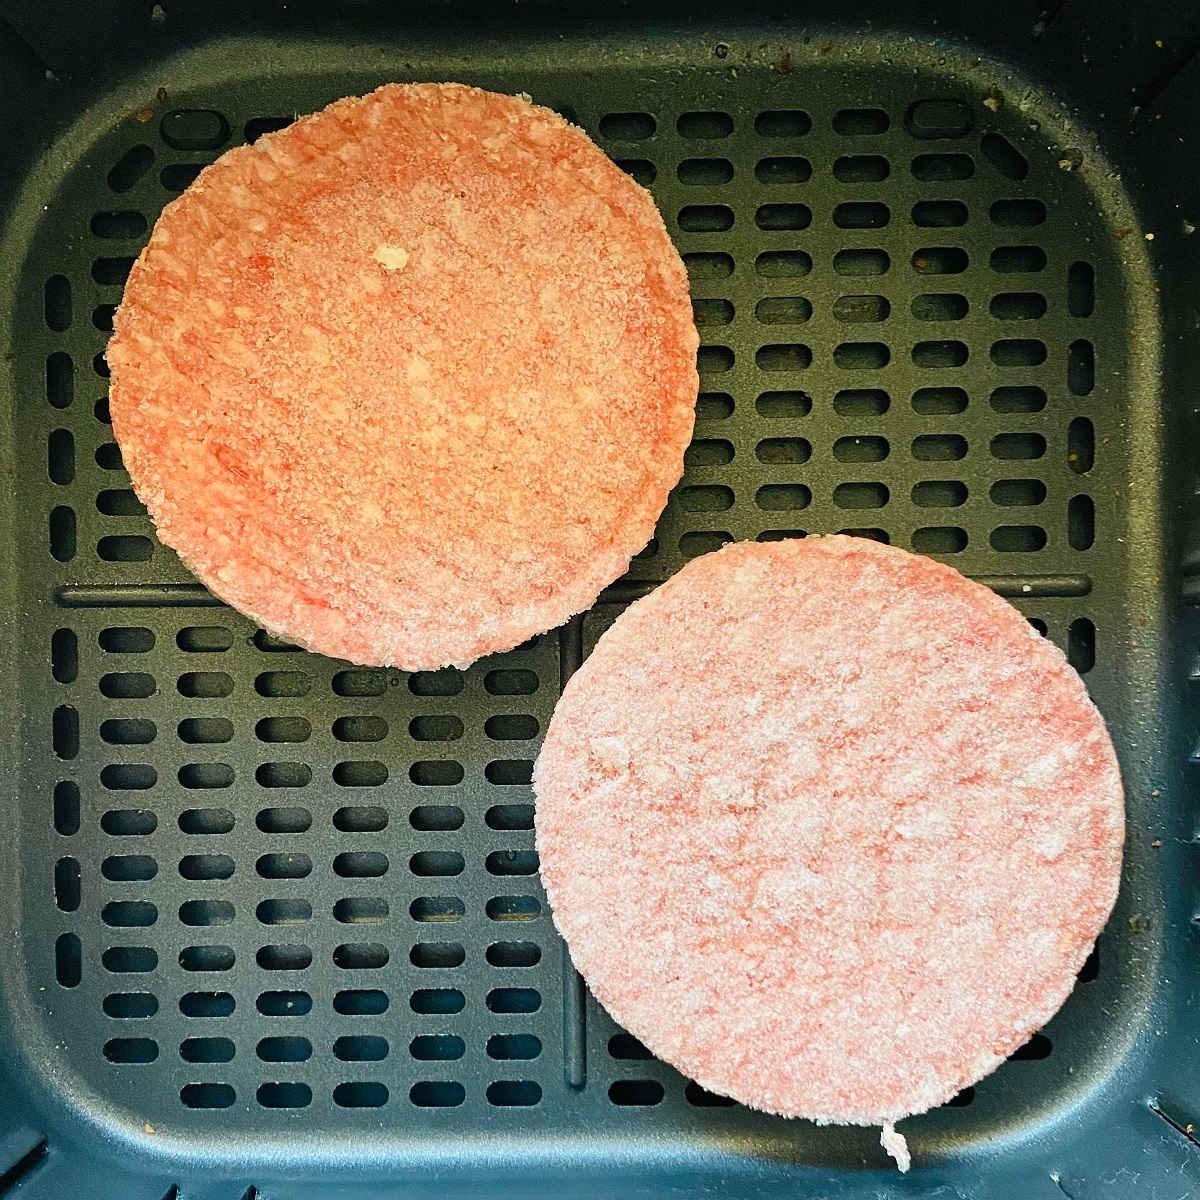 frozen burgers in air fryer basket